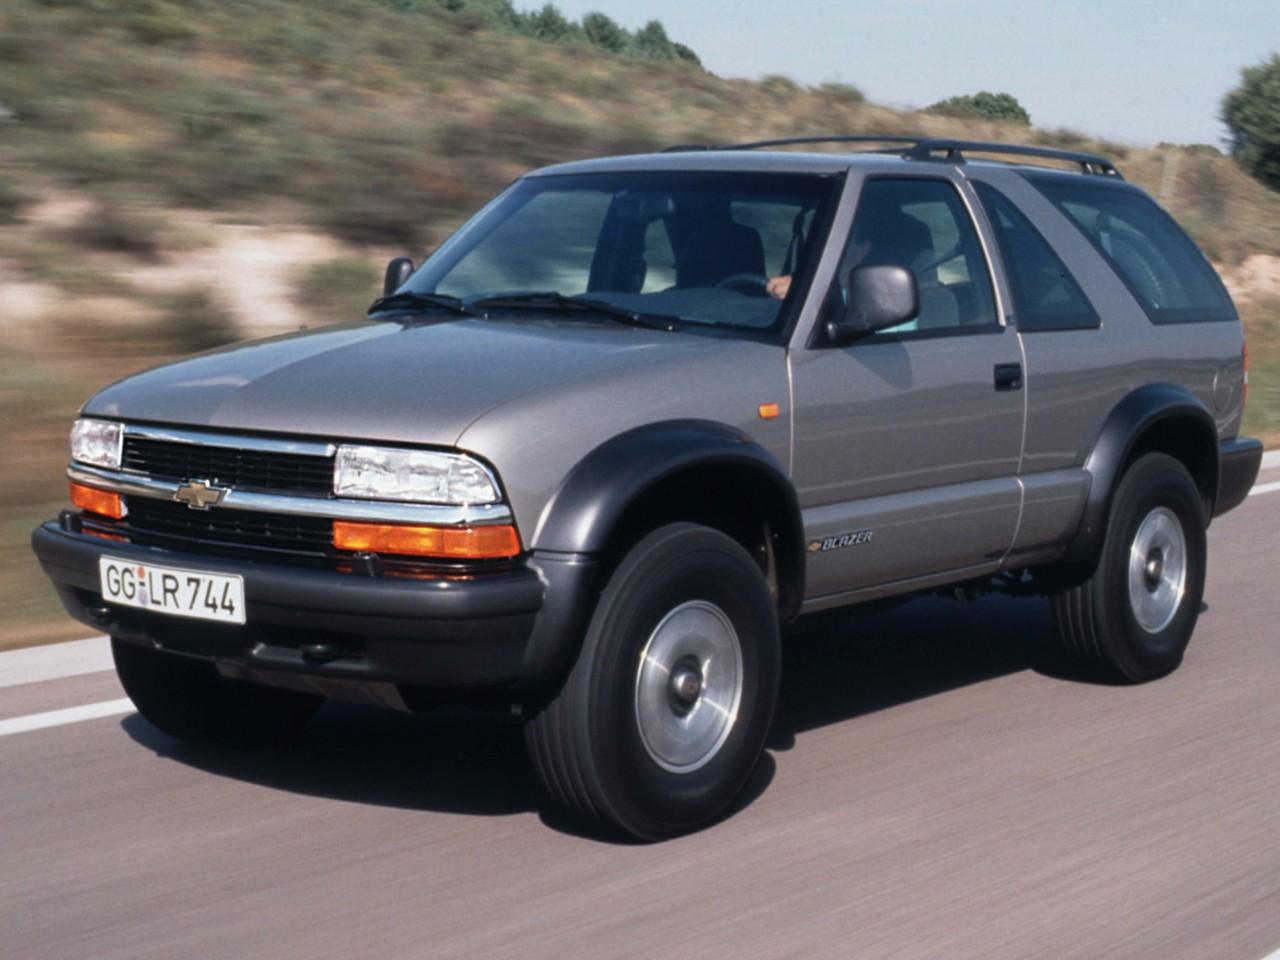 Blazer chevy blazer 2001 : CHEVROLET Blazer 3 doors specs - 1995, 1996, 1997, 1998, 1999 ...